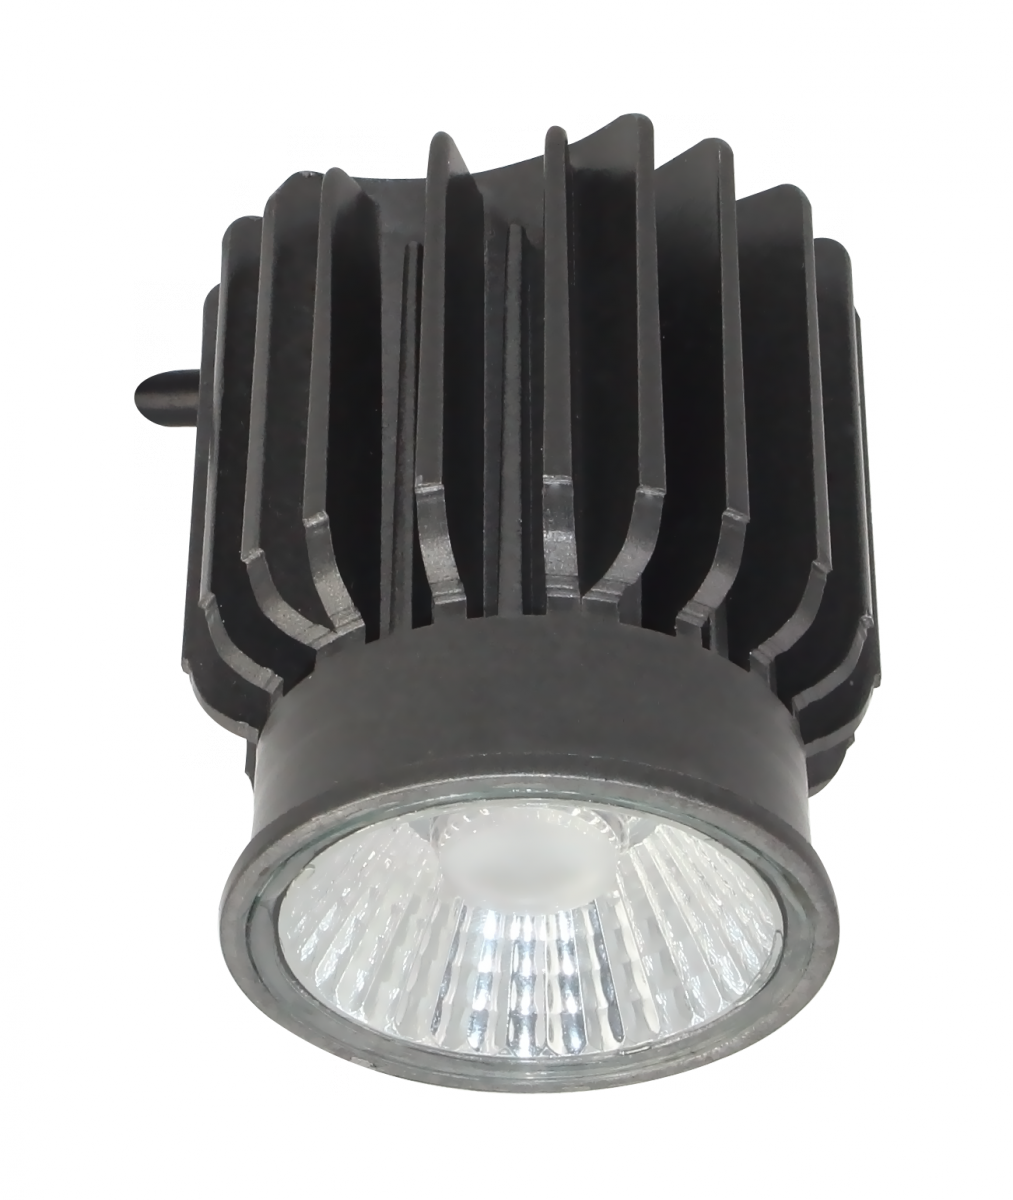 Civilight Module CVM003T15-7578 Festanschluss 230 Volt 15.0W 1100lm 3000K warm weiß